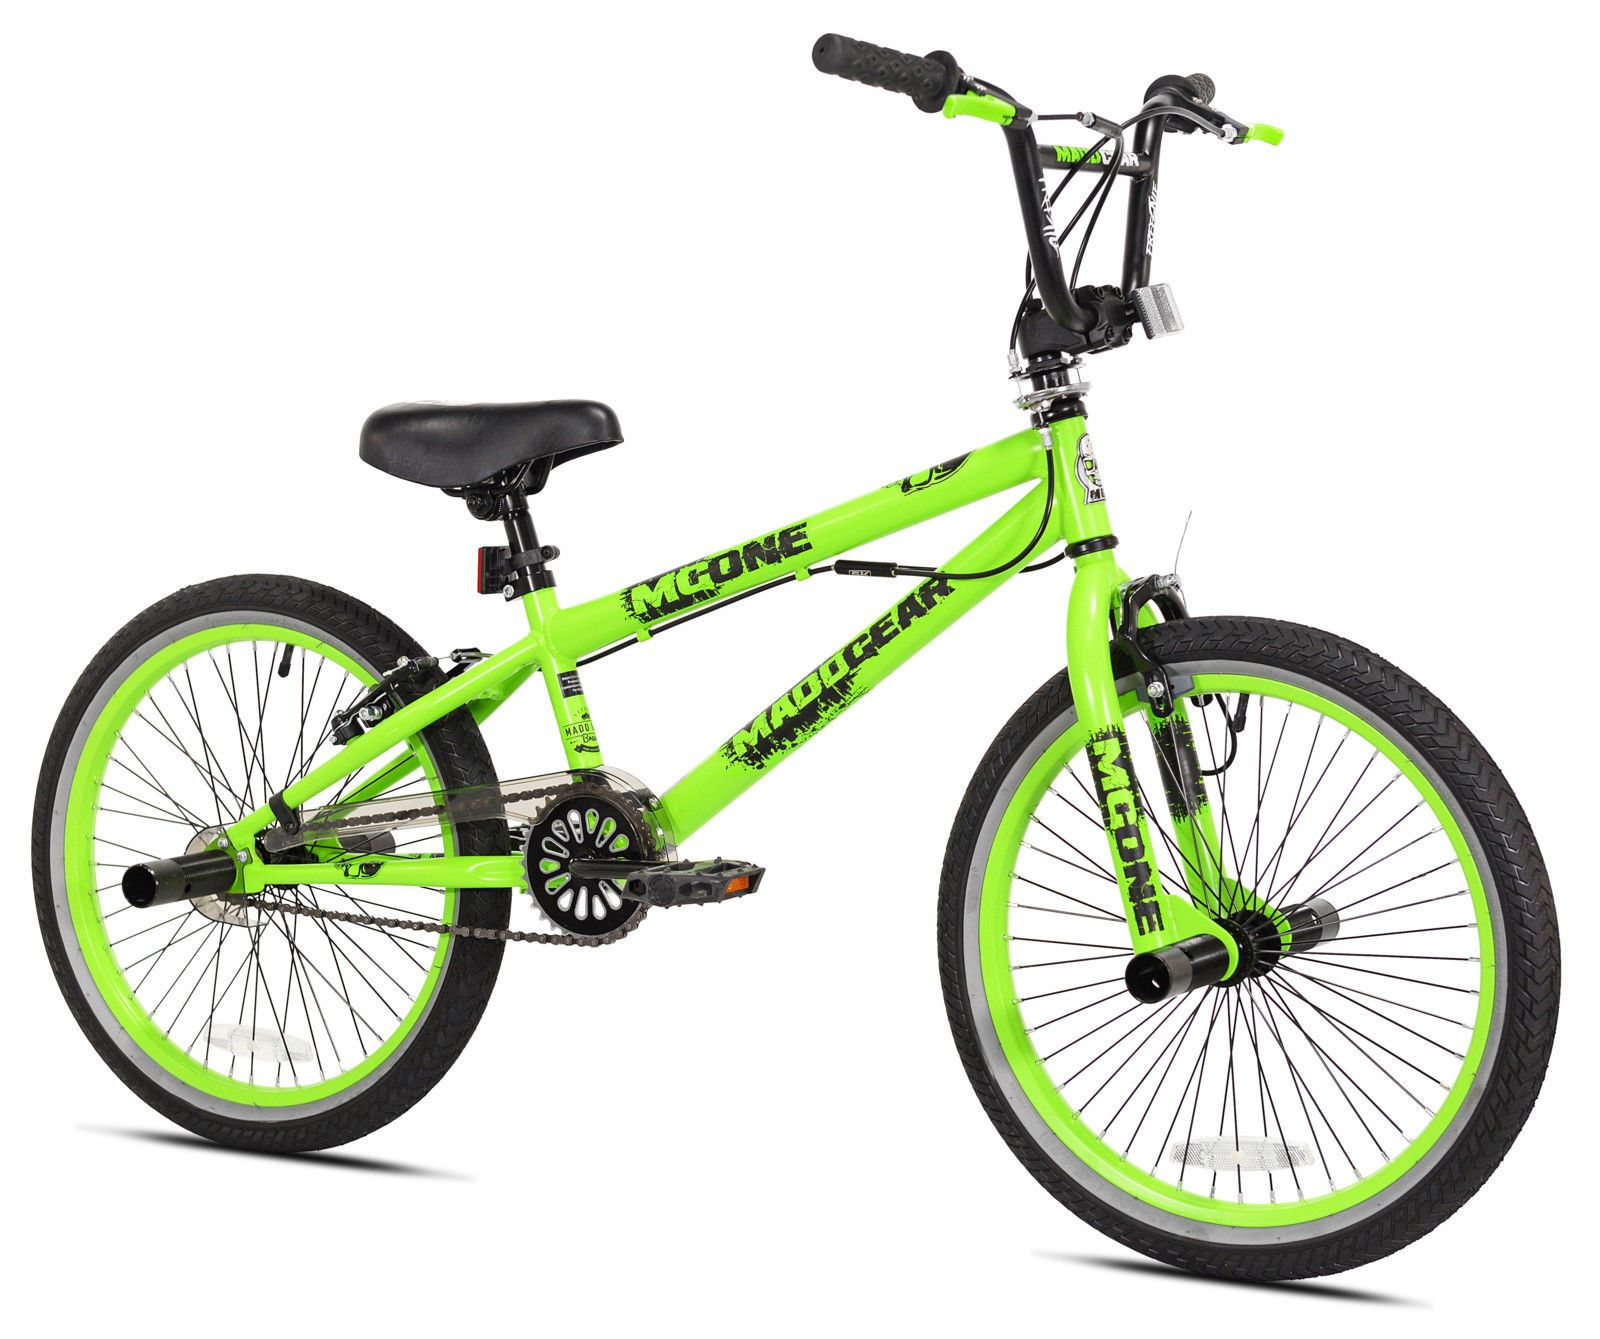 20 Inch Frame Bmx Boys Madd Gear Bicycle Bik Lightweight Stunt Bike In 2020 Bmx Bikes Bmx Bicycle Bmx Bike Frames